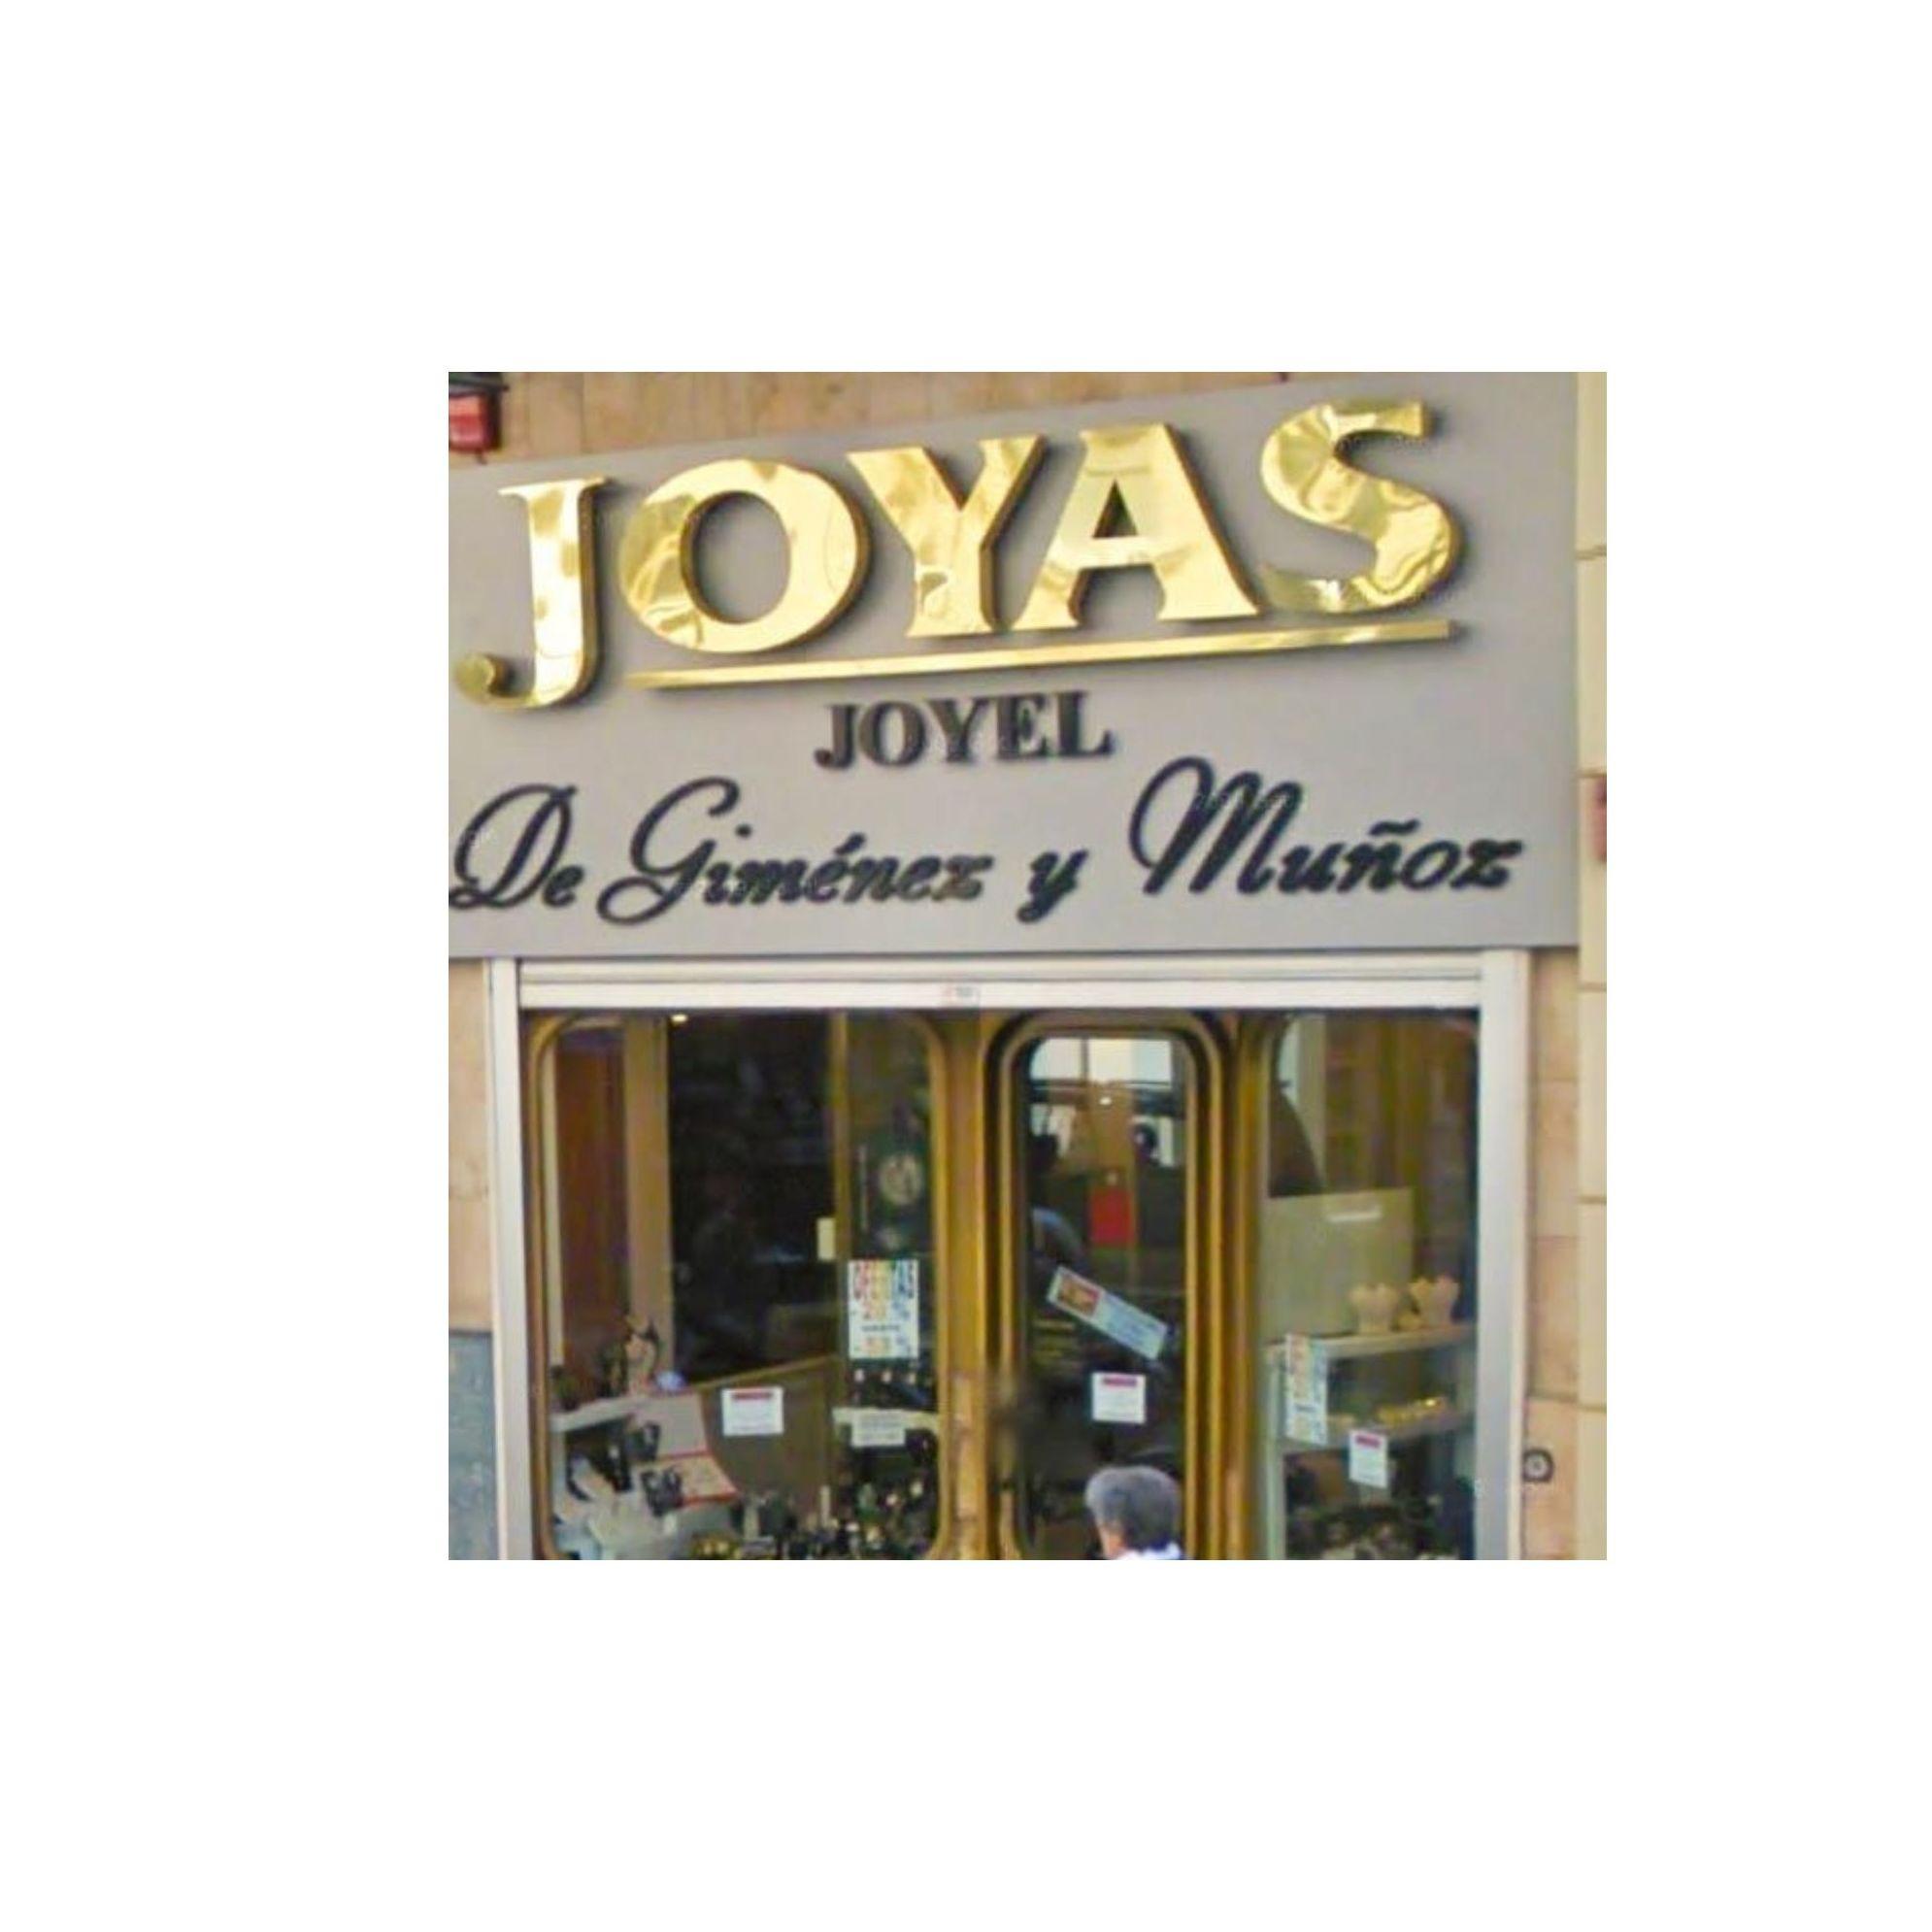 Foto 33 de Joyería en Pamplona | Joyas Joyel